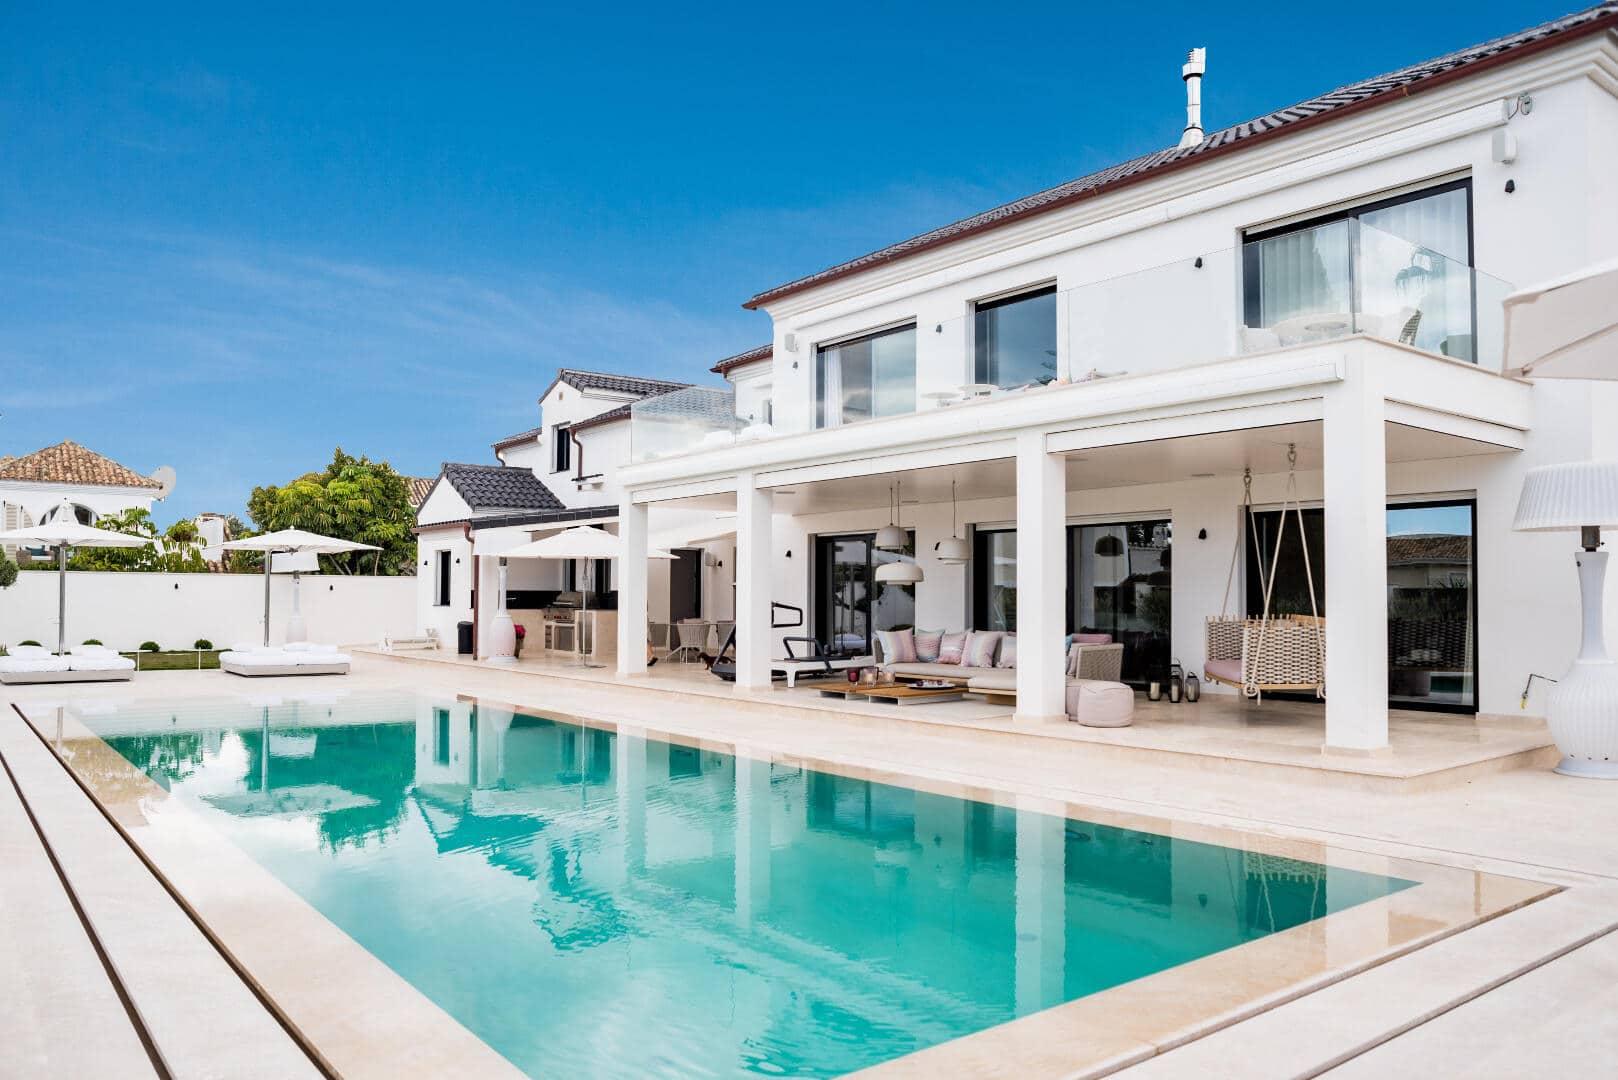 Beach side Villa in Casablanca Marbella's Golden Mile